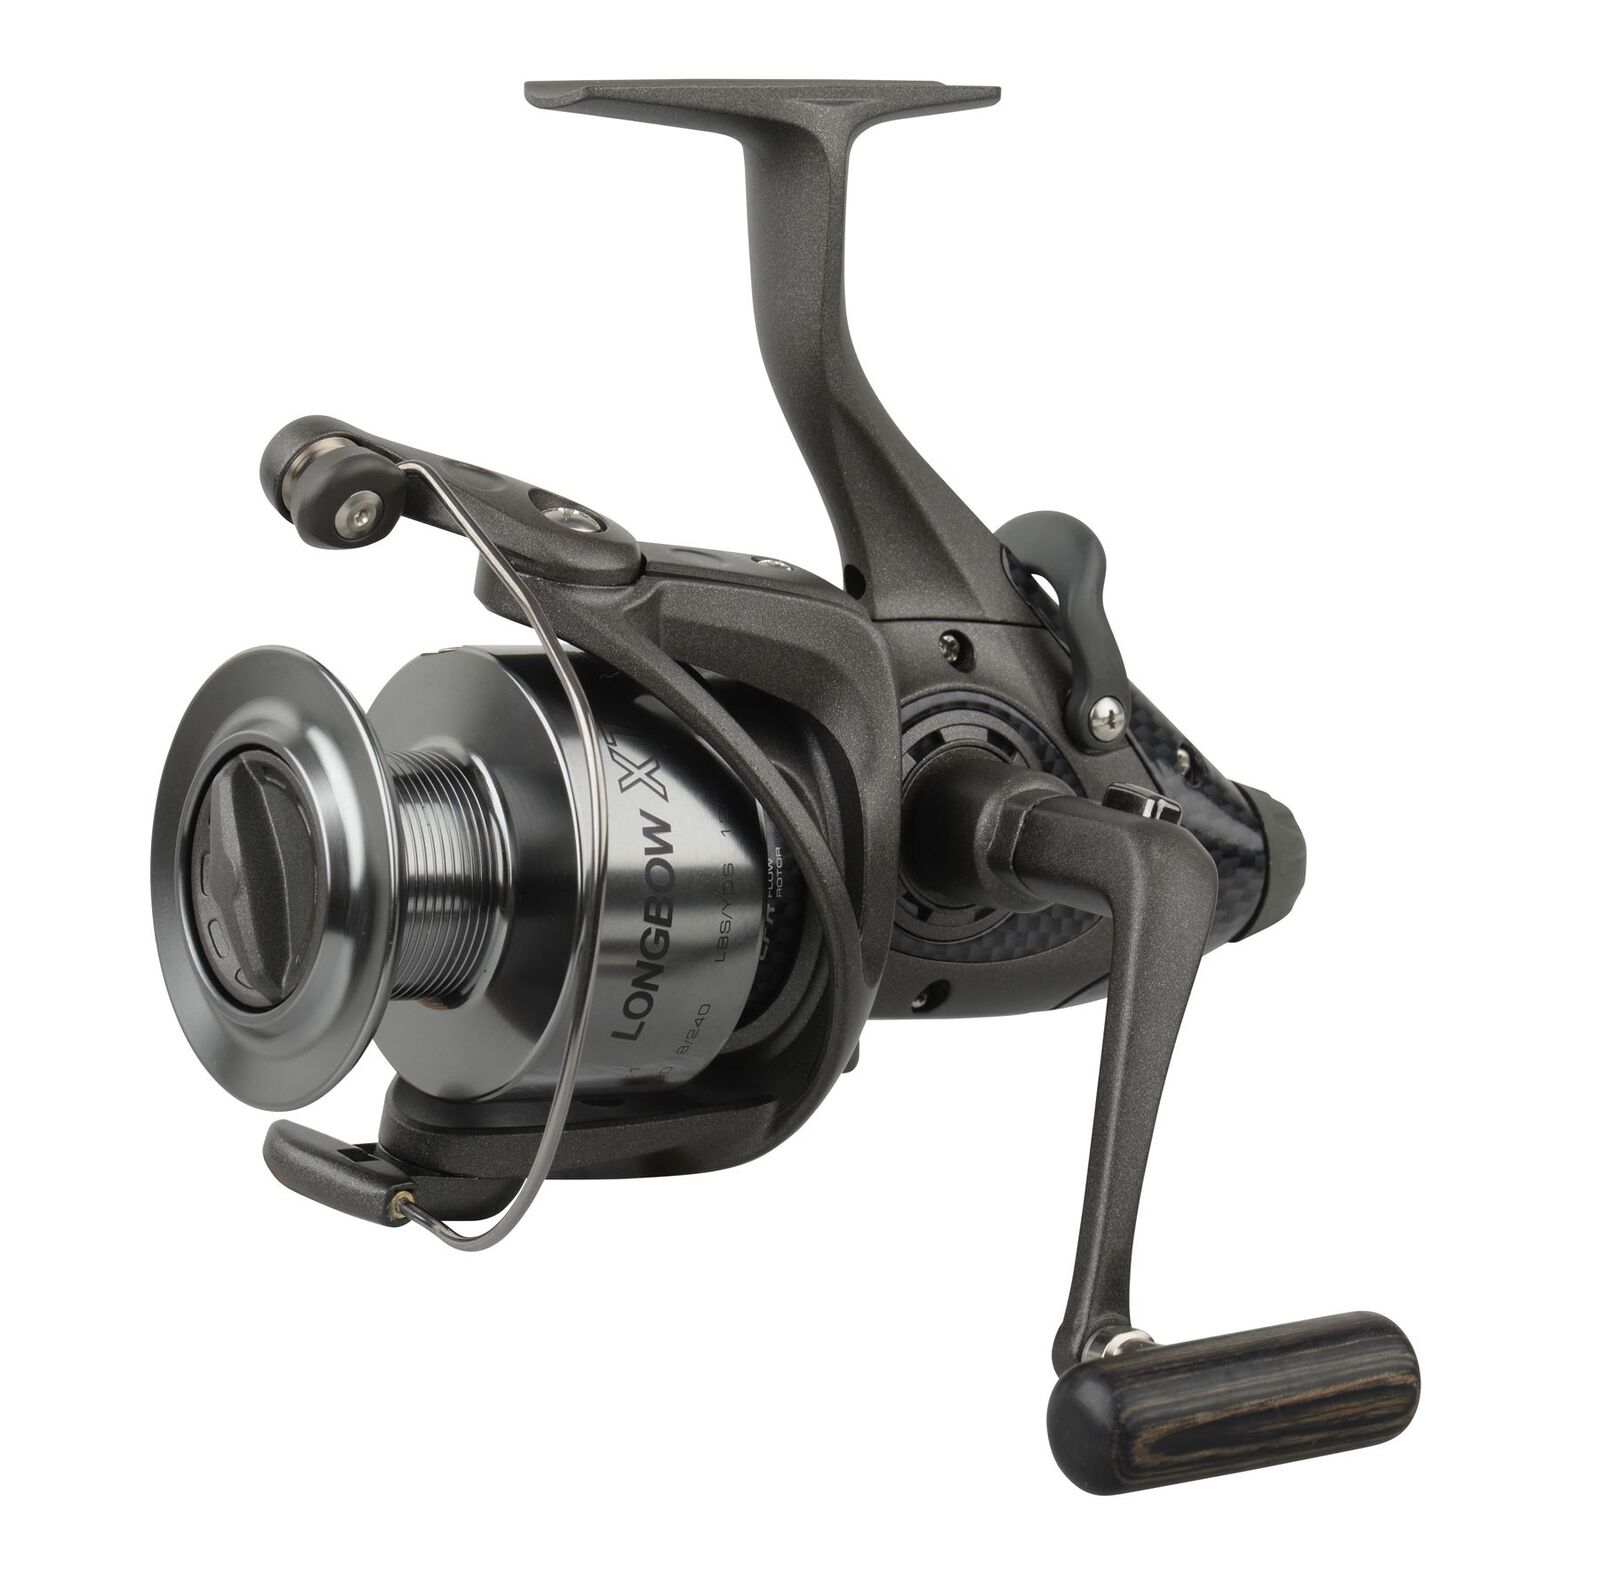 Okuma Longbow XT Baitfeeder Fishing Reel LBXT-655 5+1bb Graphite Spool 54212